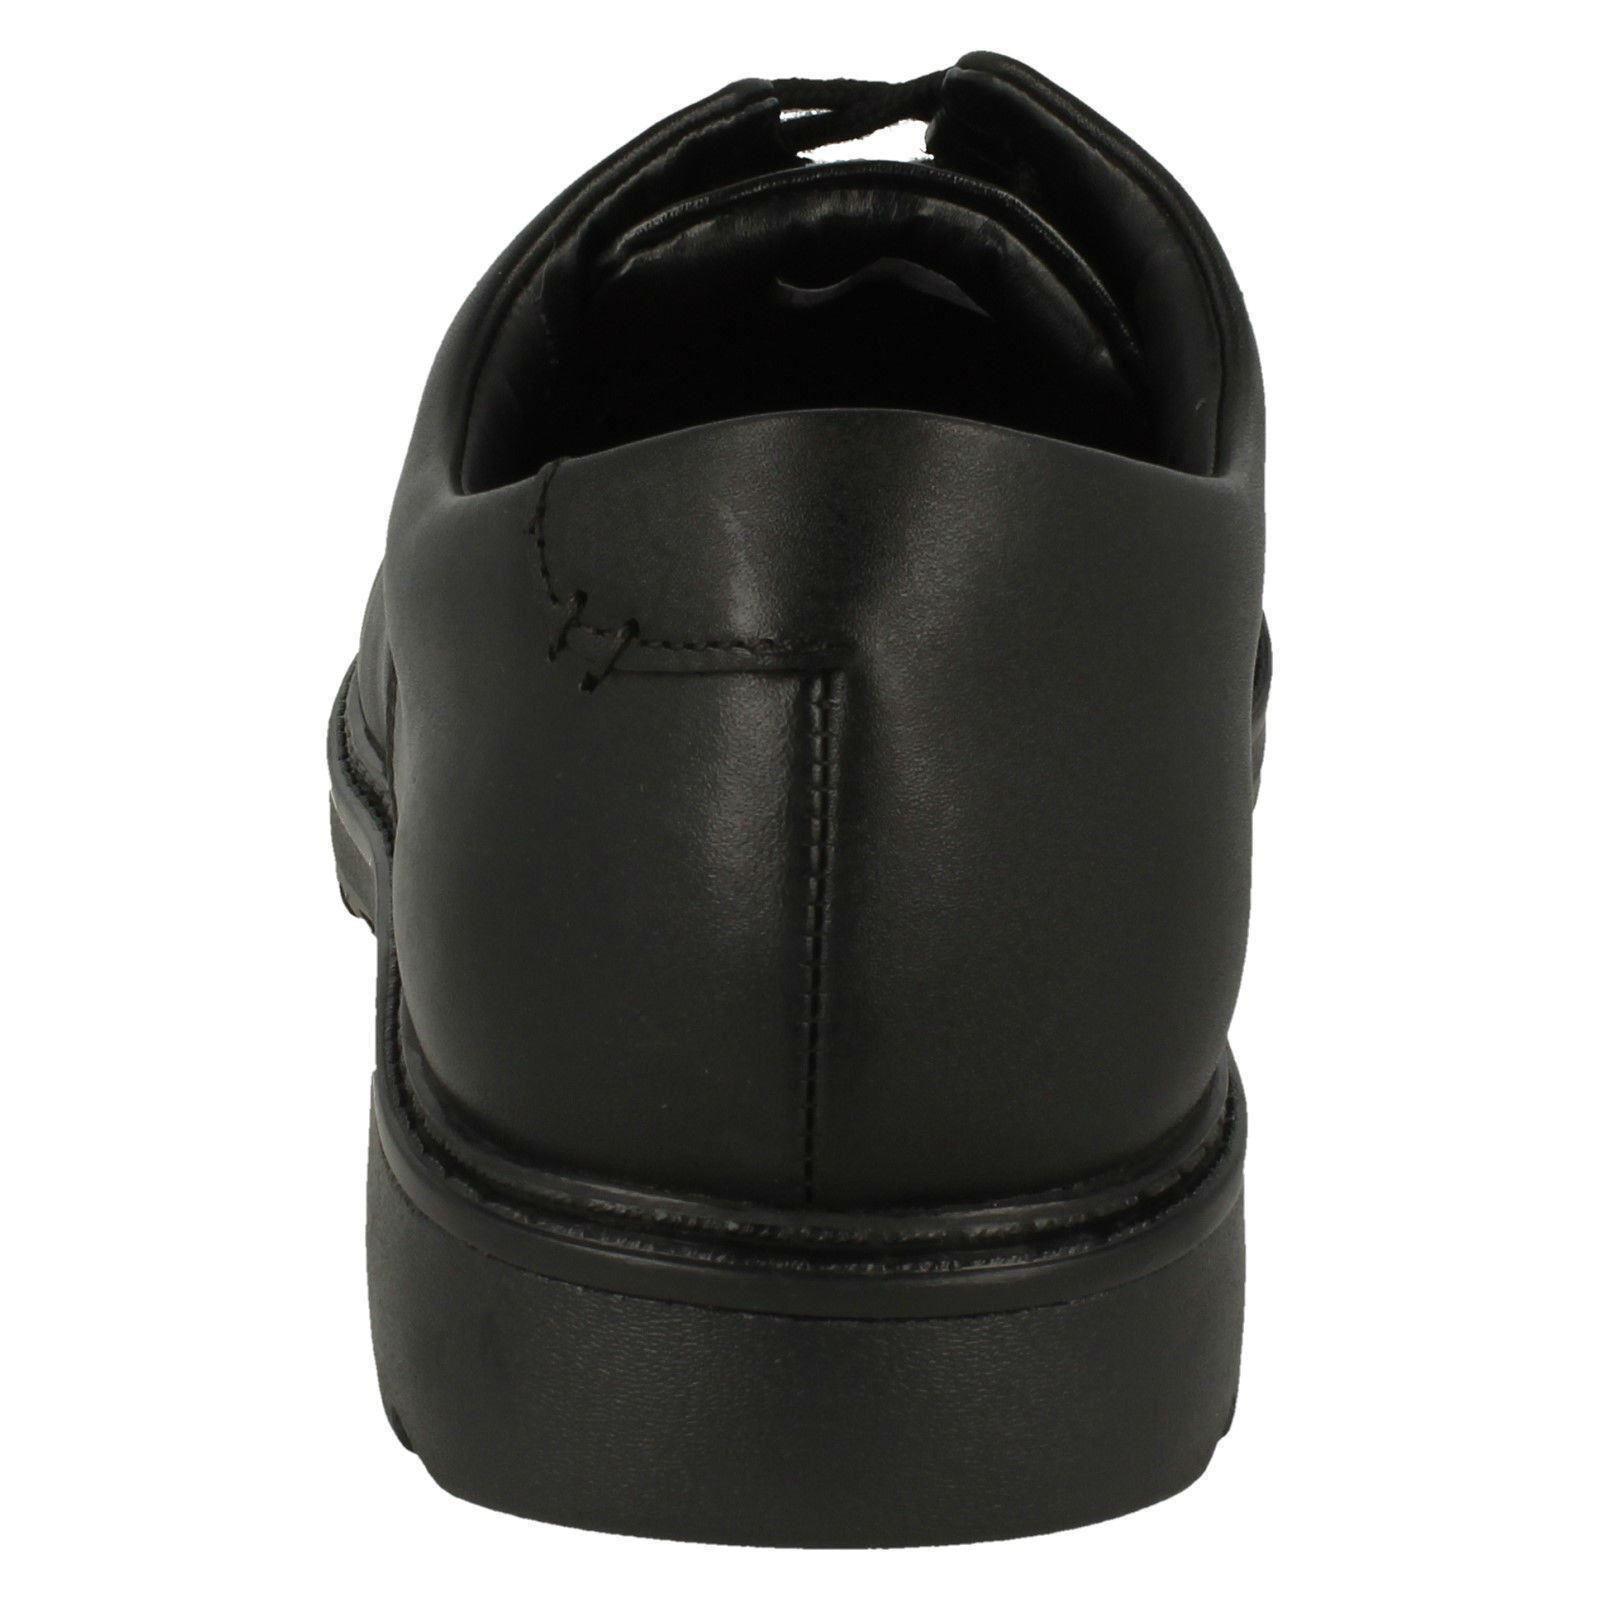 niño formales Clarks cordones Zapatos Clarks negros 'asher de con Grove' YSqE6w